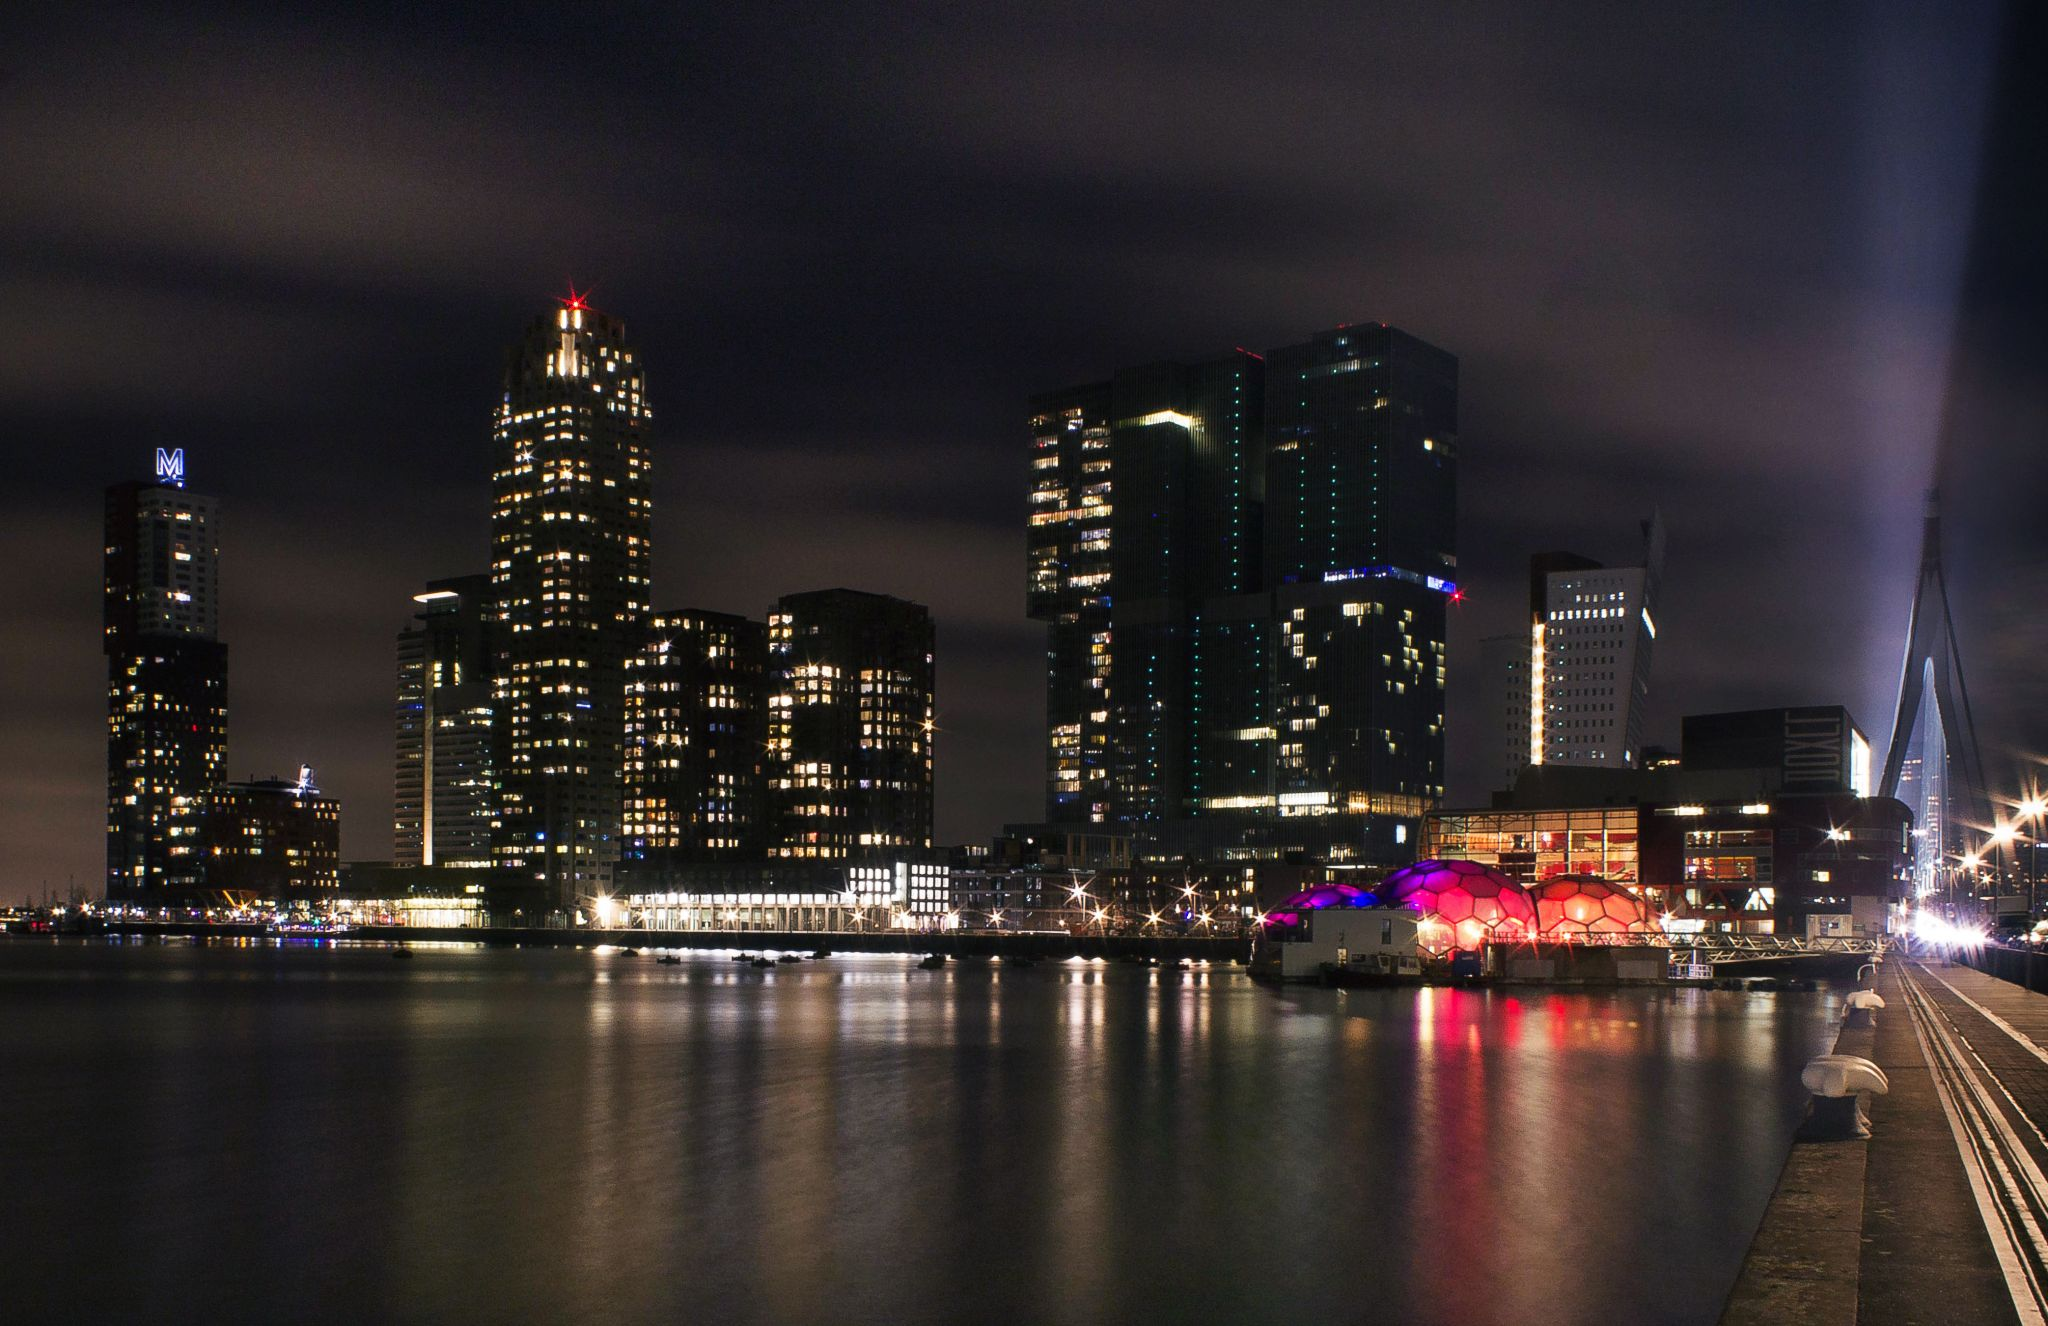 Rijnhaven - Rotterdam, Netherlands